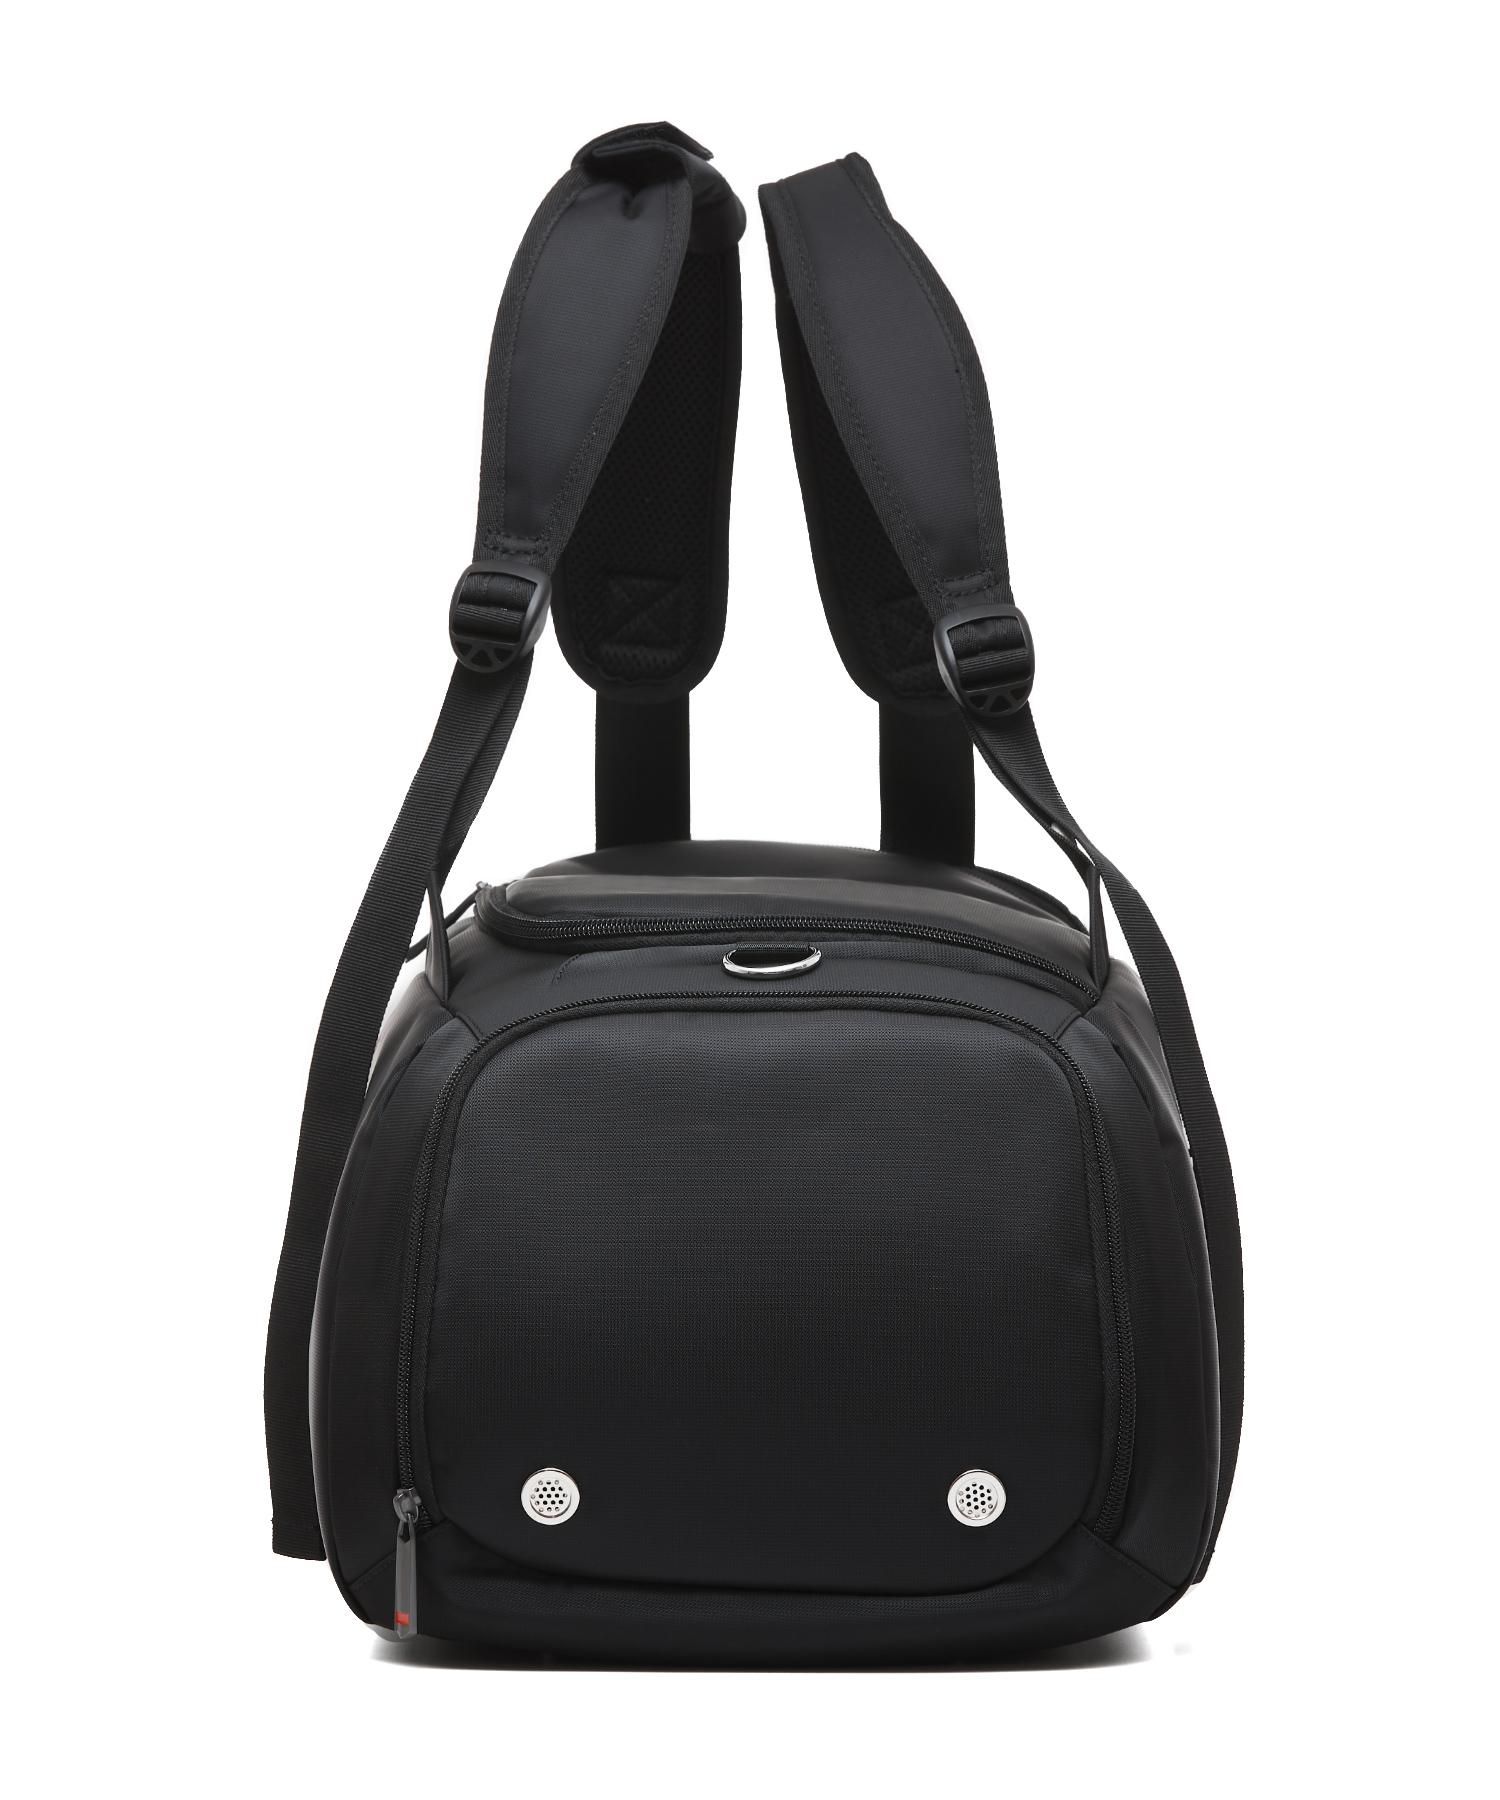 Krimcode Sport Attire Duffle Bag Side